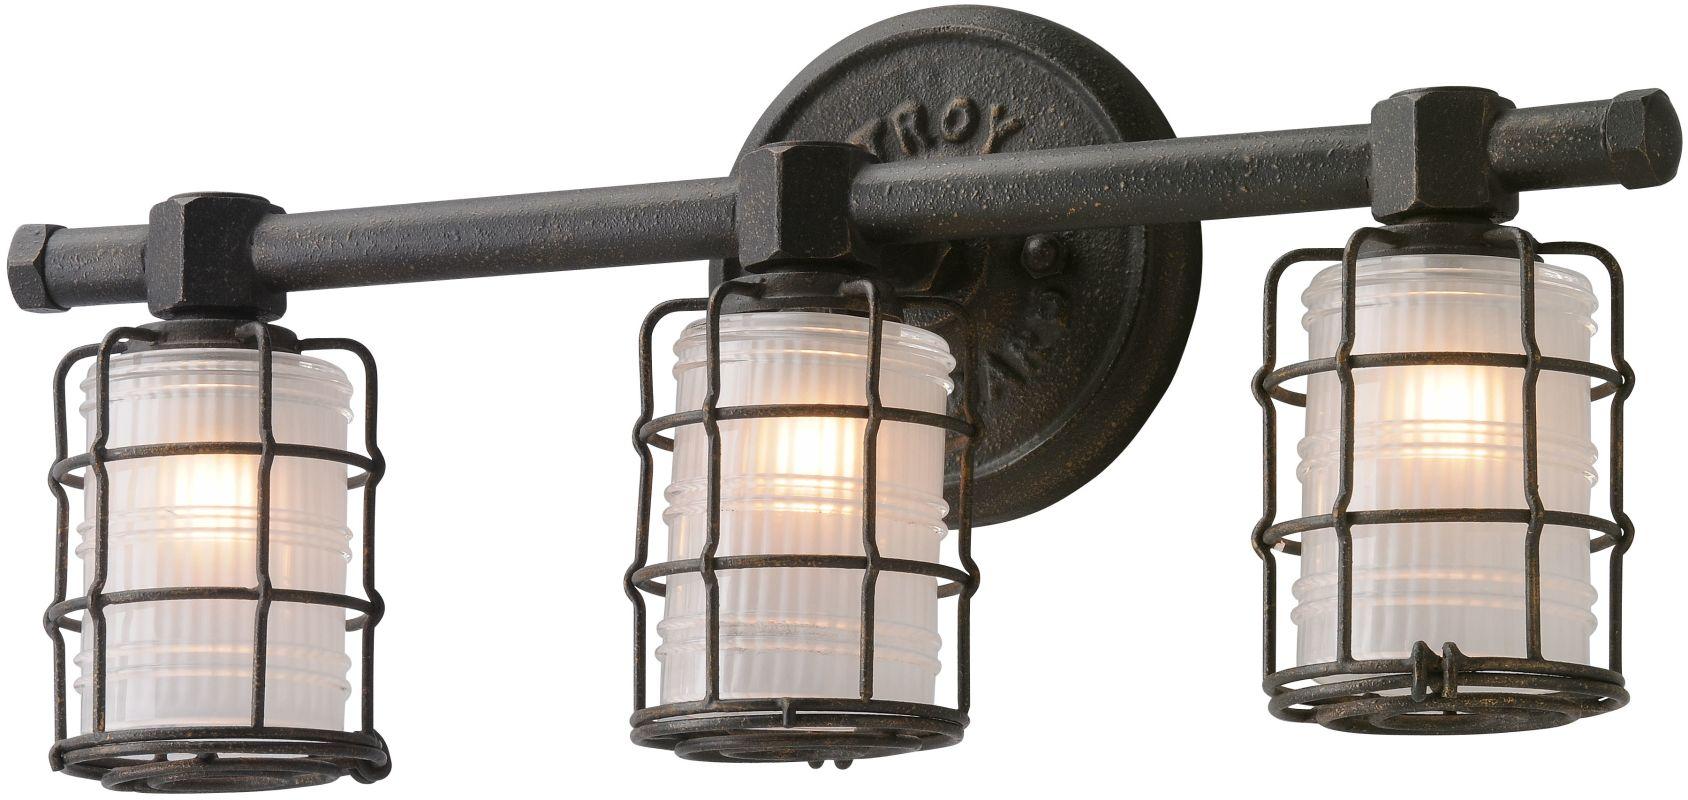 Progress Lighting Archie 3 Light 8 75 In Polished Chrome: Troy Lighting B3843 Vintage Bronze Mercantile 3 Light